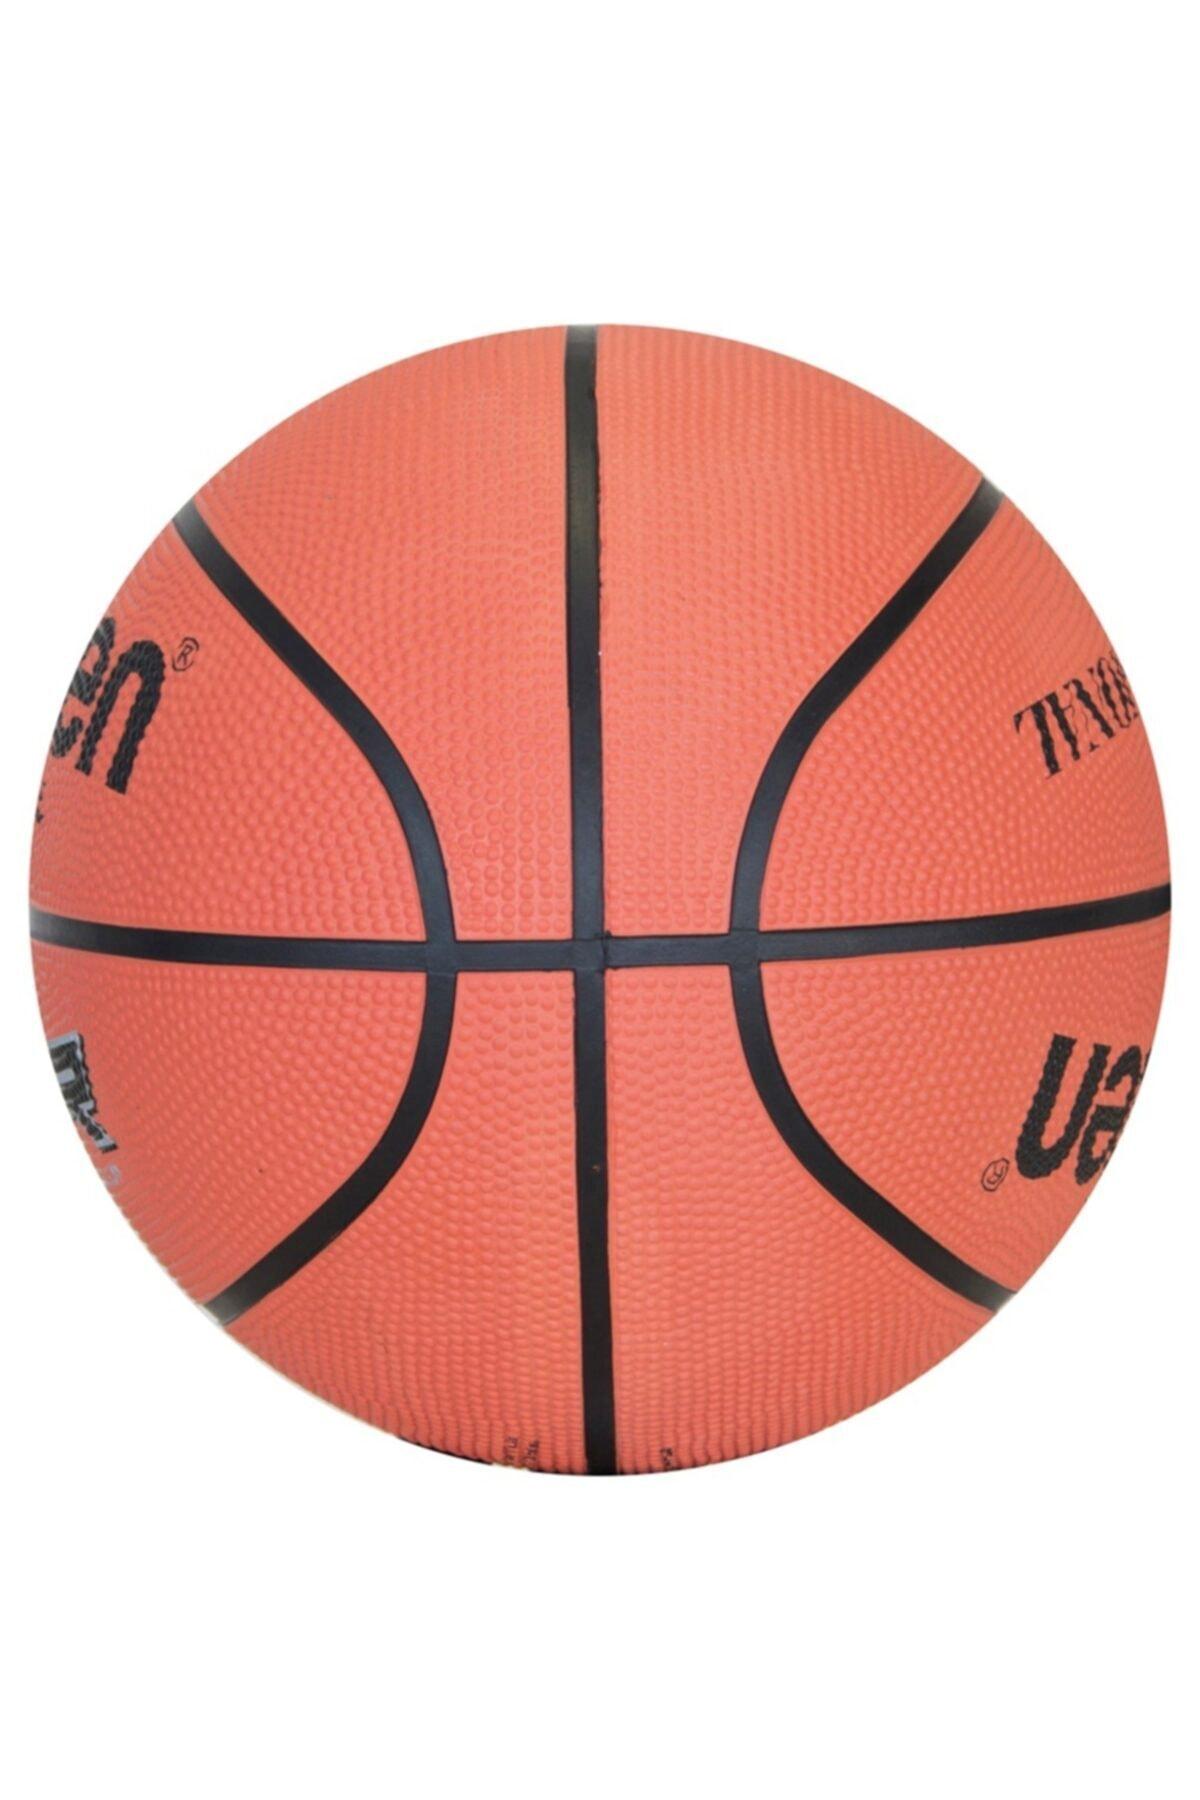 MOLTEN Basketbol Topu 1